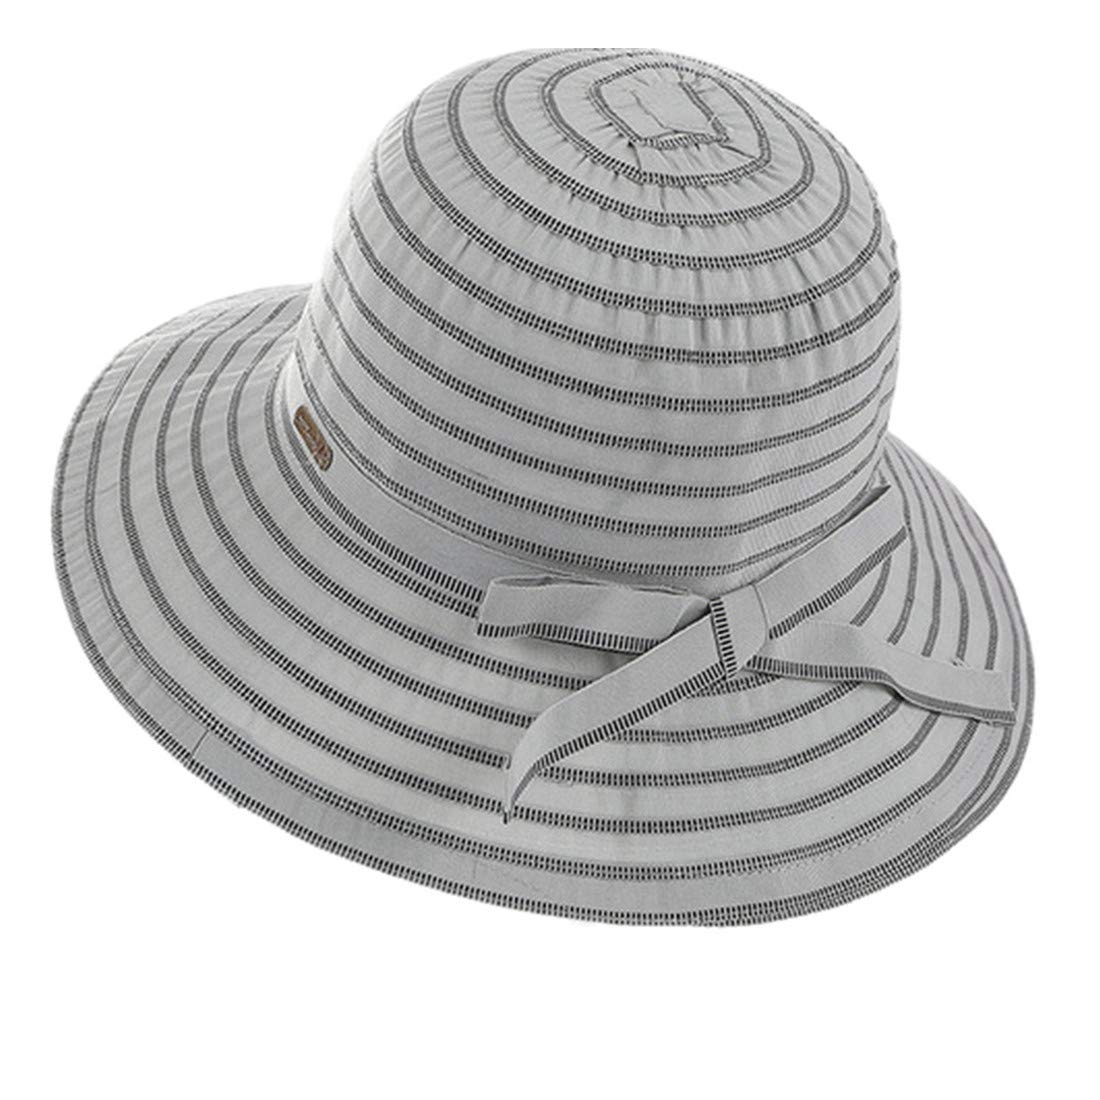 1 pcs Summer Casual Striped Sun Hats Foldable Big Brim Beach Hat Shade Sunscreen Pink Cap Cotton Bucket Hat